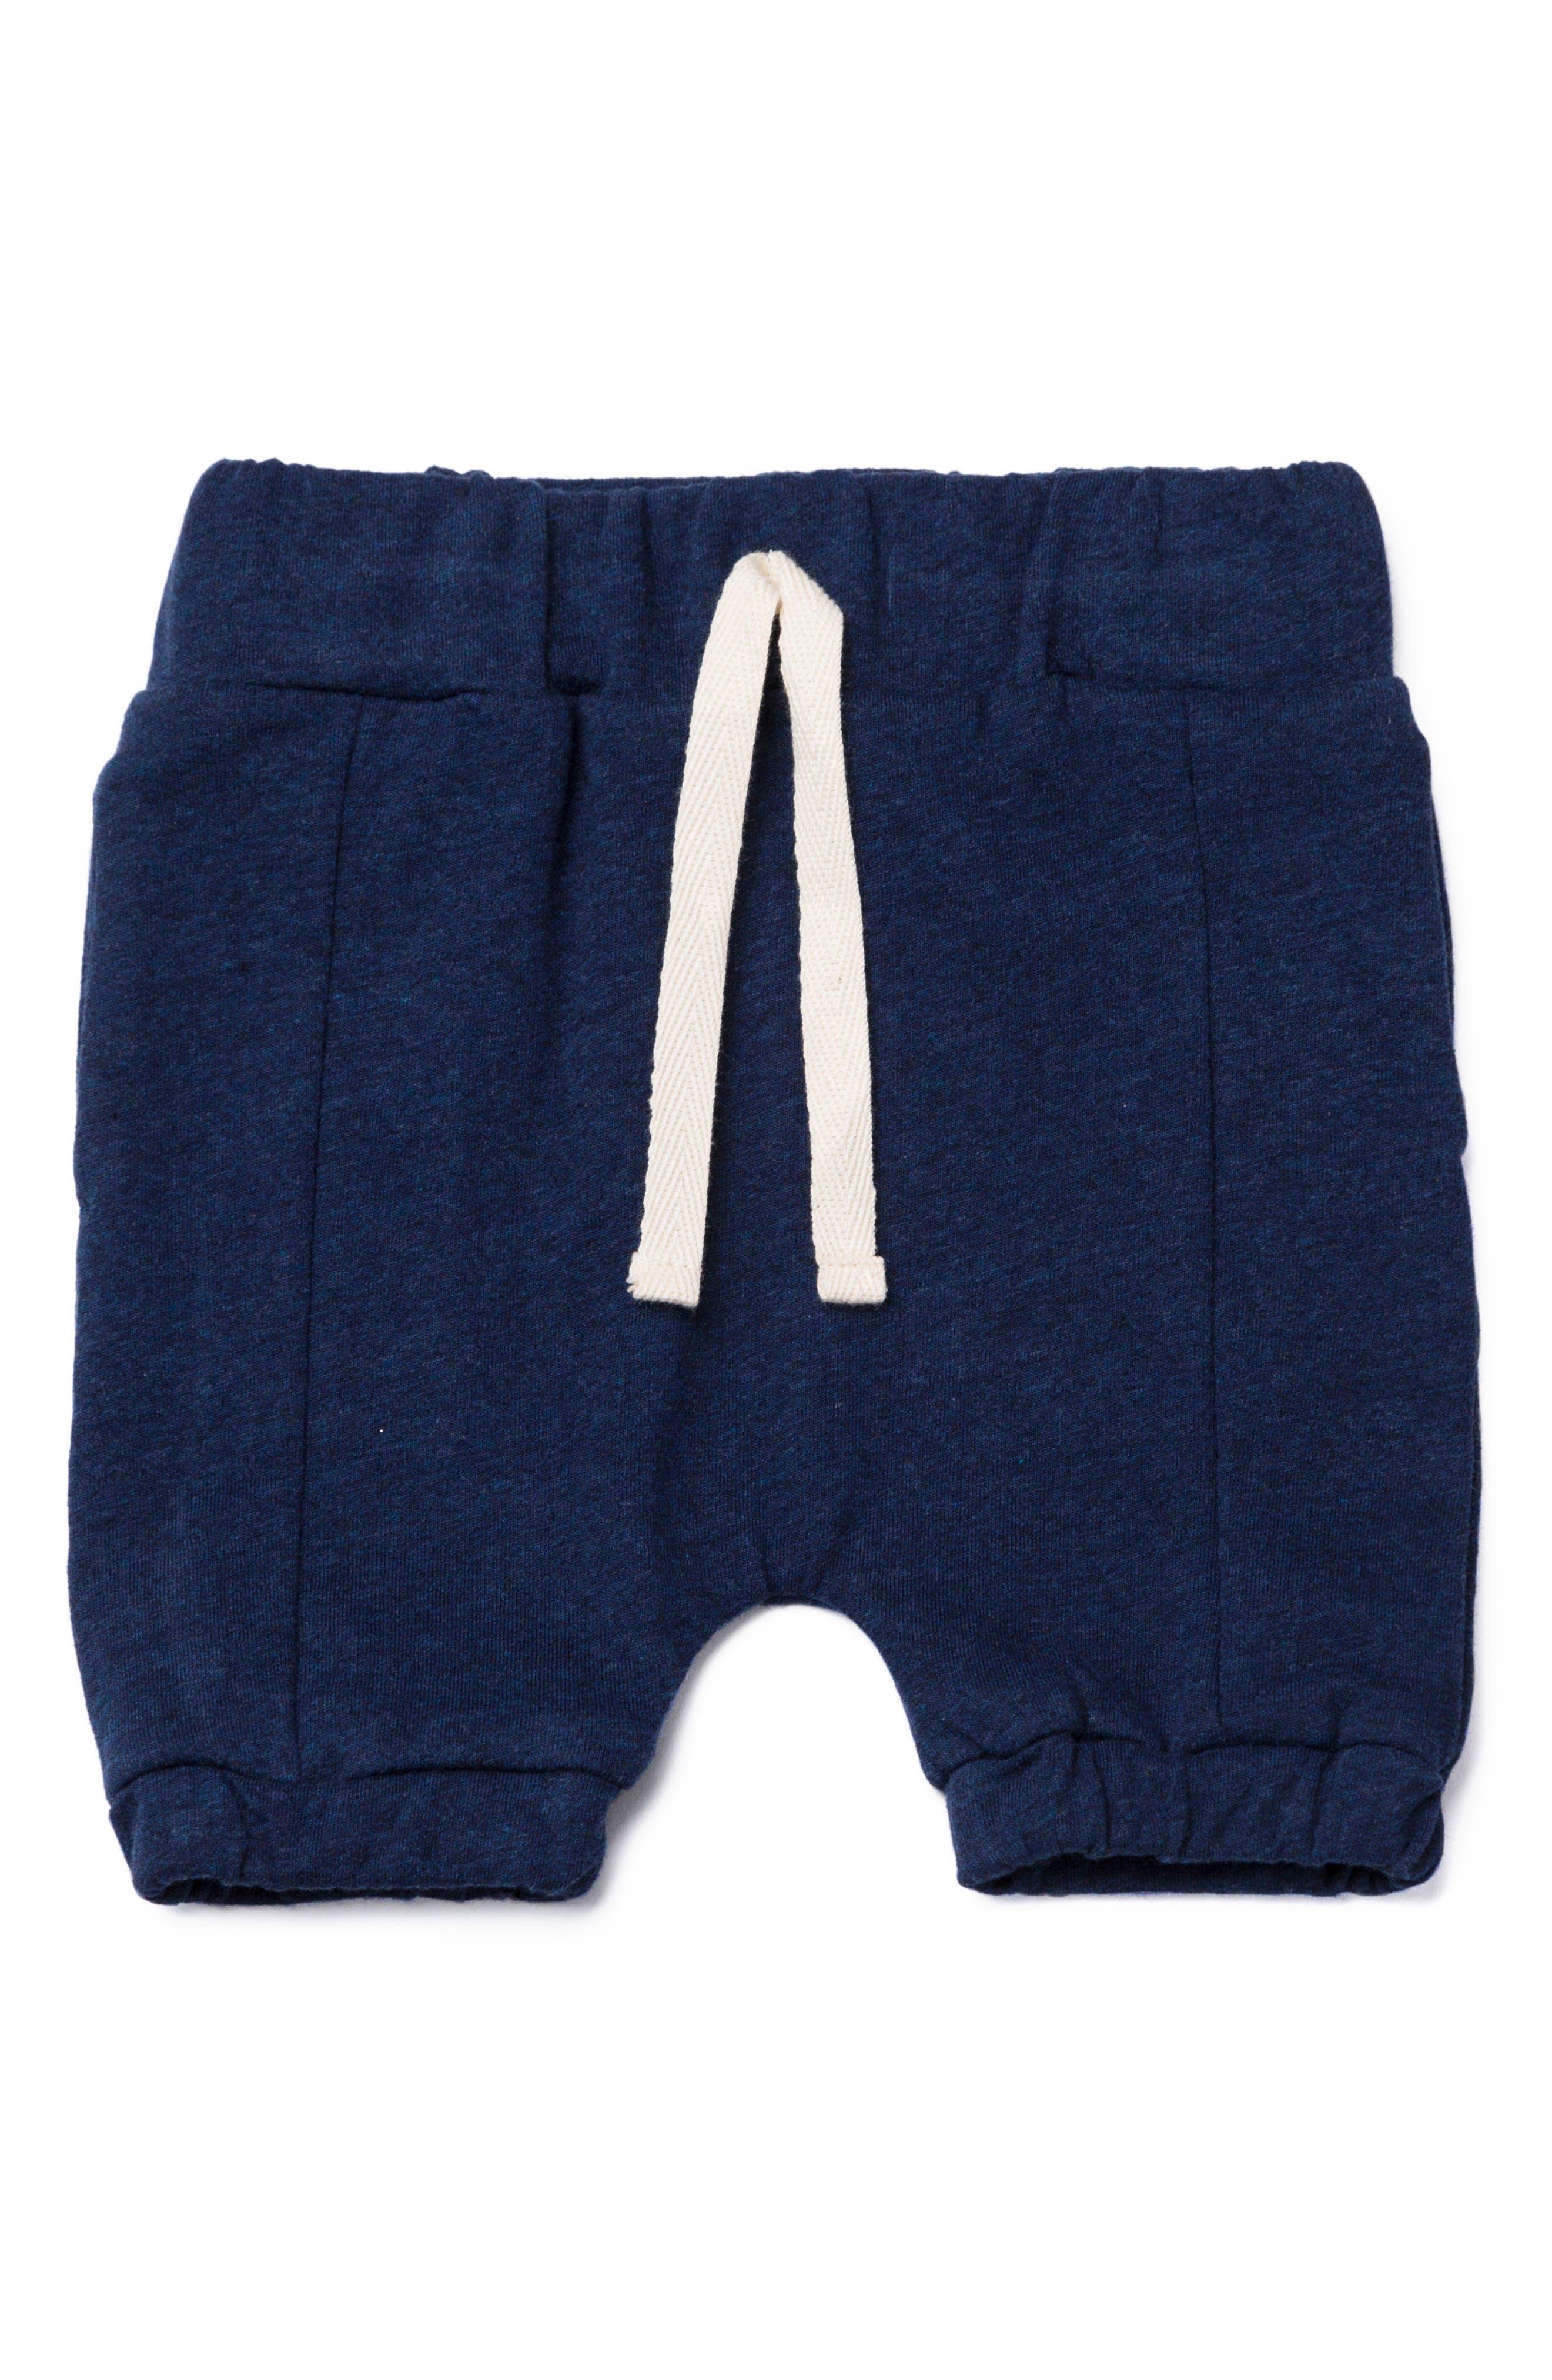 Beach Organic Cotton Jogger Pants,                         Main,                         color, Navy Heather